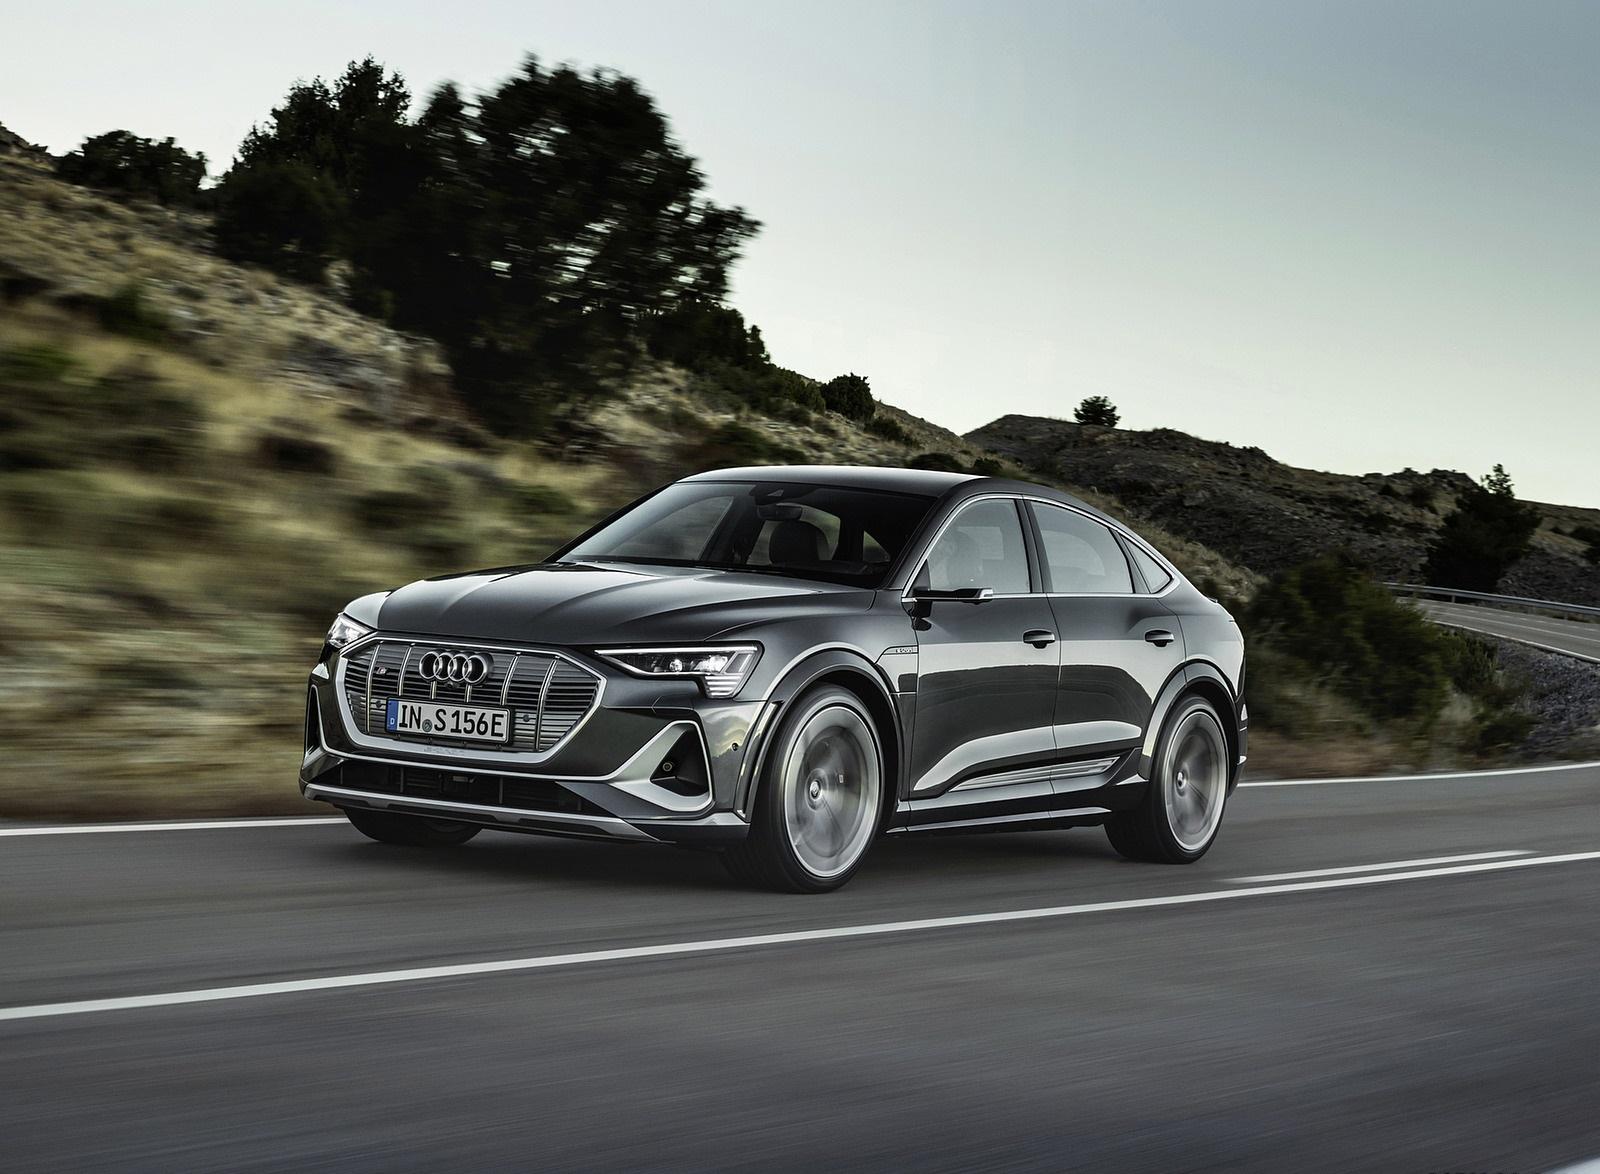 2021 Audi e-tron S Sportback (Color: Daytona Gray) Front Three-Quarter Wallpapers  (2)